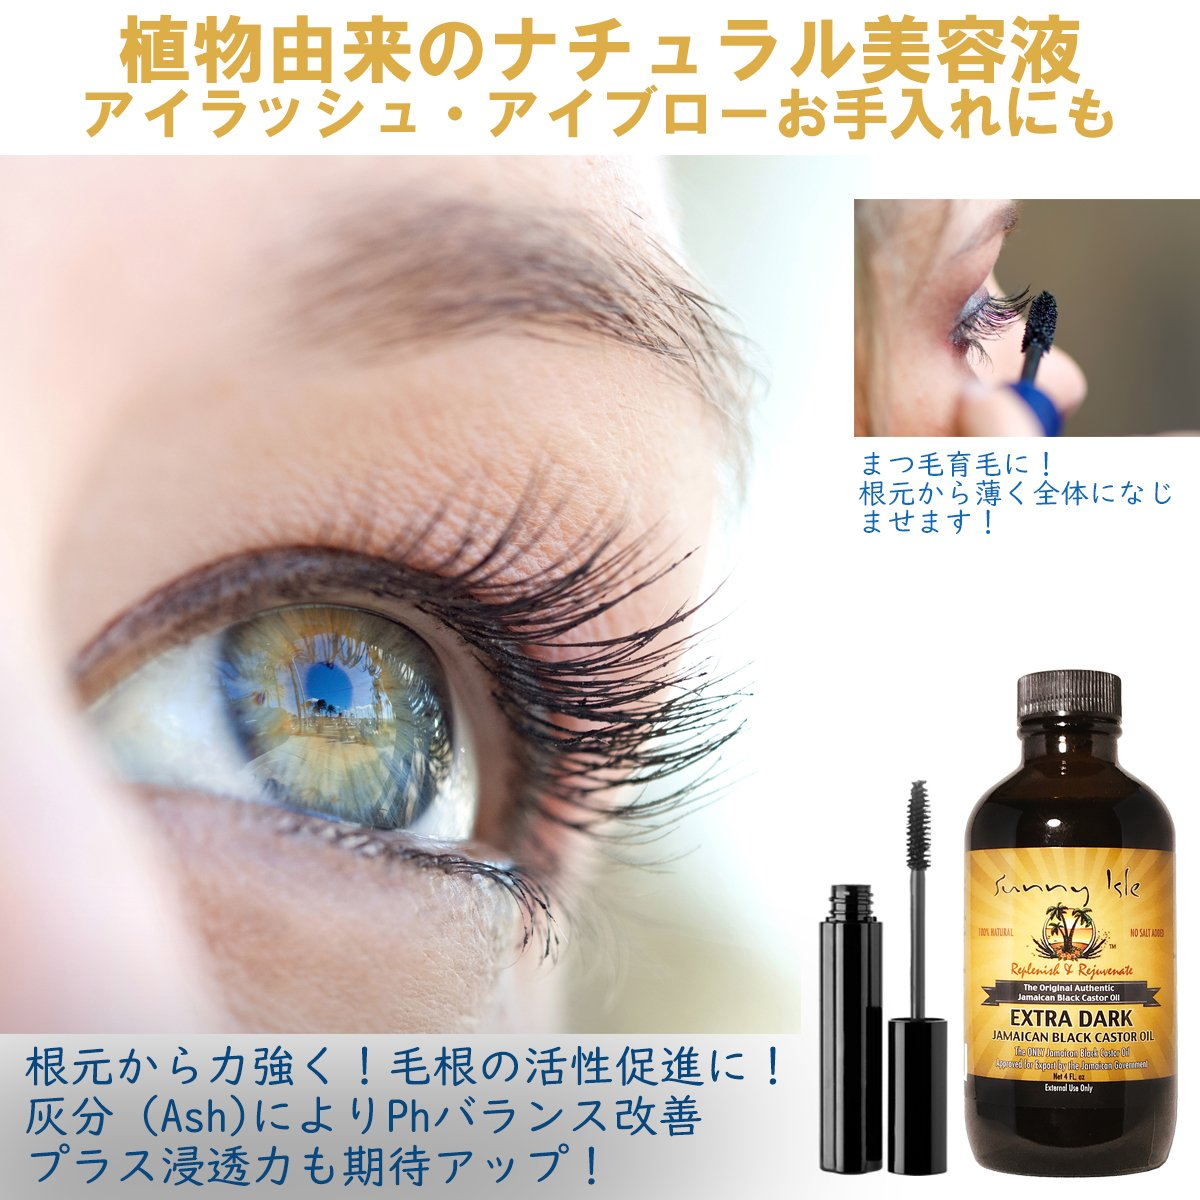 Sunny Isle Jamaican Black Castor Oil Extra Dark 4 Oz Amazon